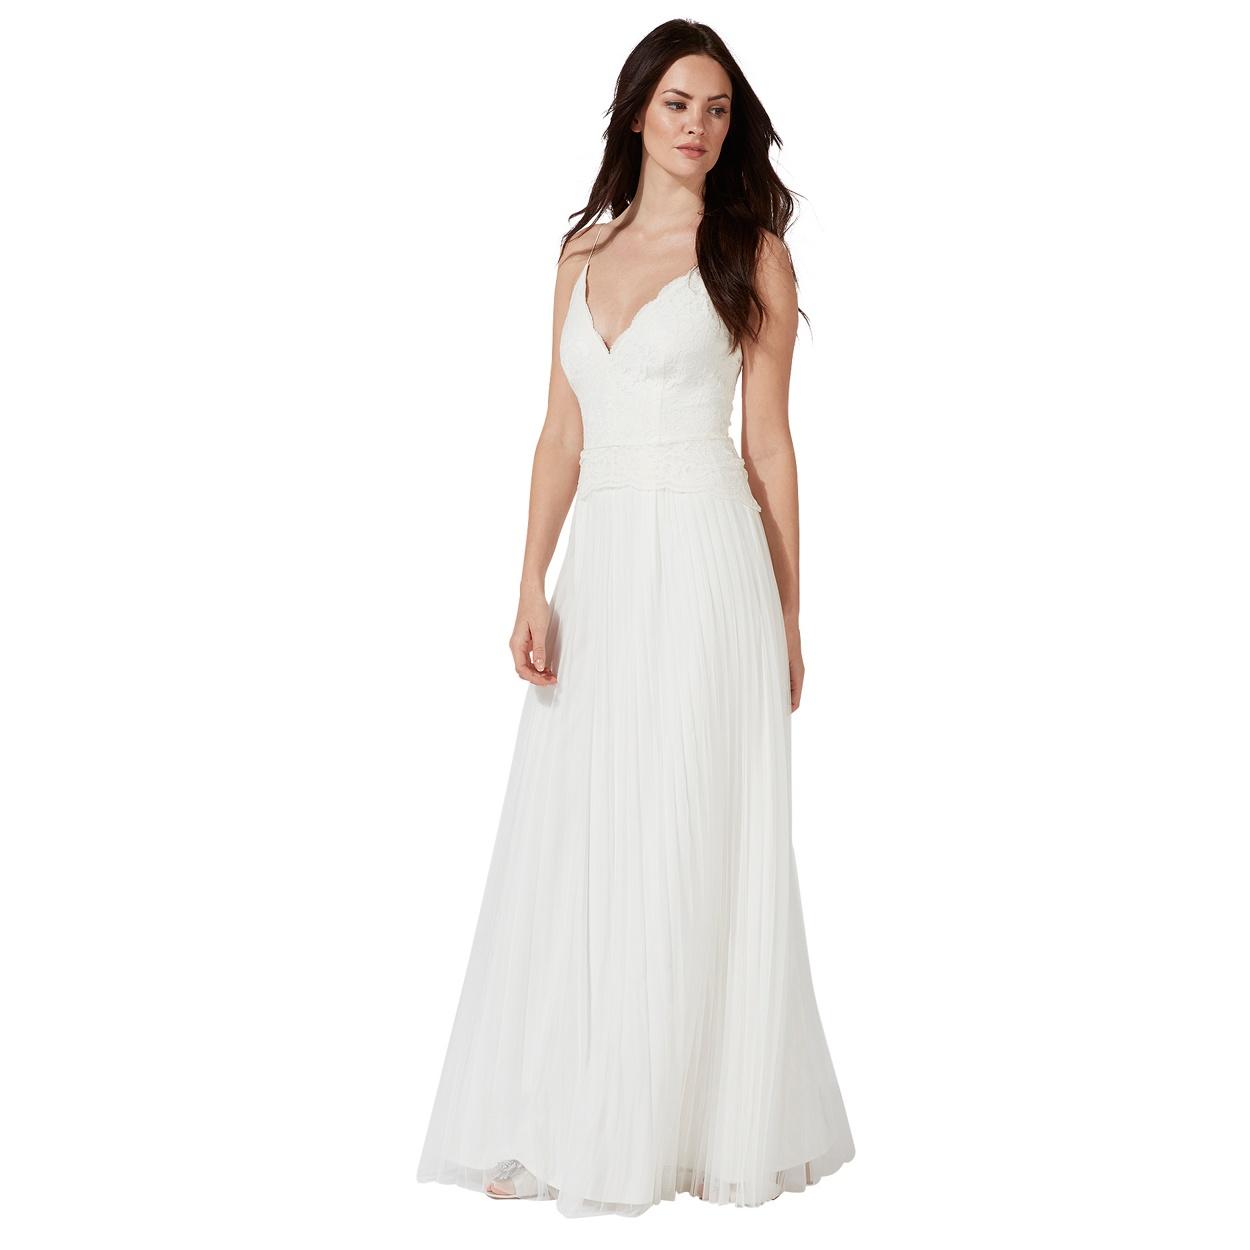 wedding dresses borrow wedding dress Debut Ivory Alicia v neck wedding dress